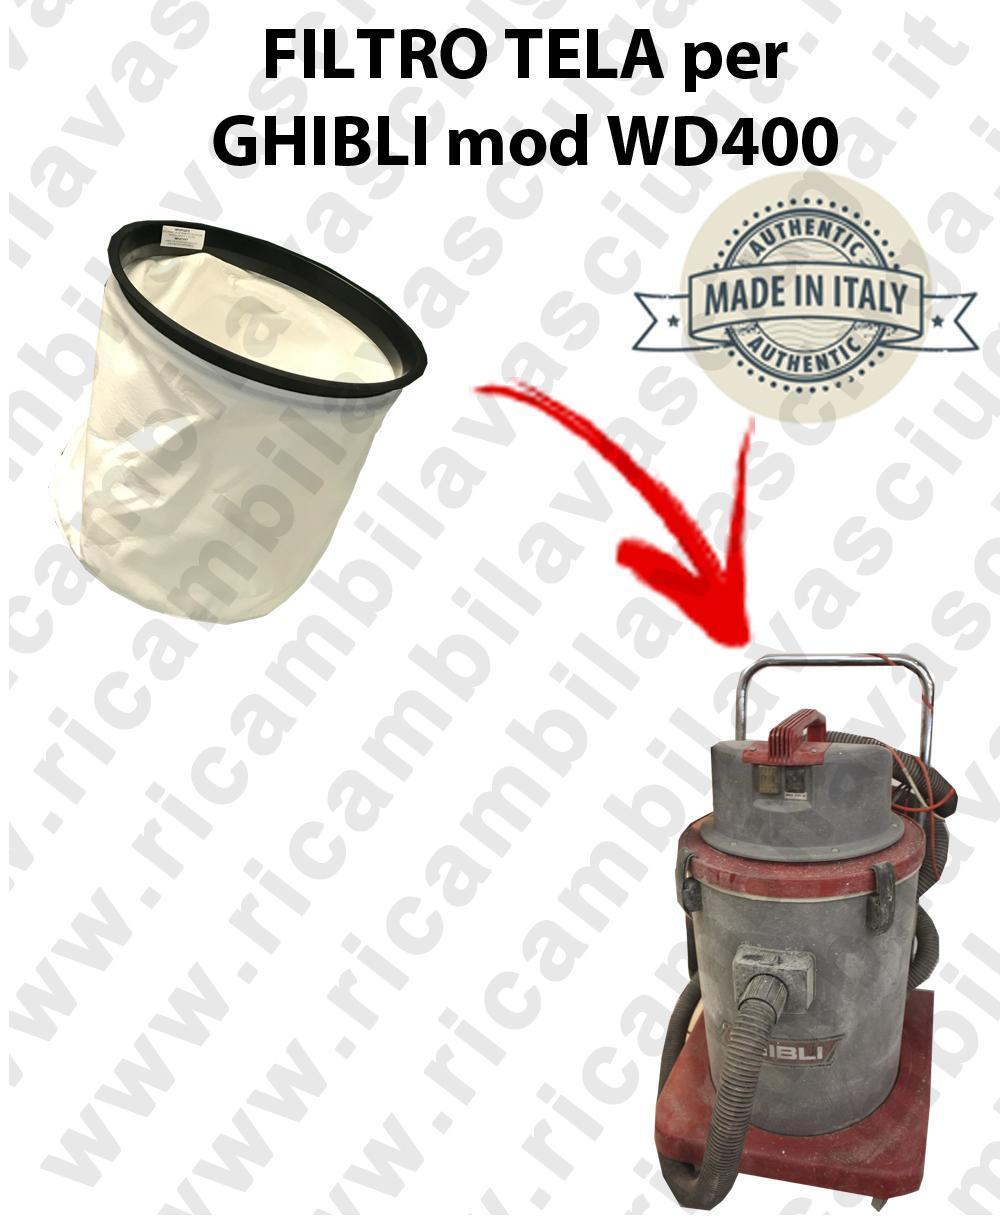 FILTRE TOILE pour aspirateur GHIBLI Reference WD400